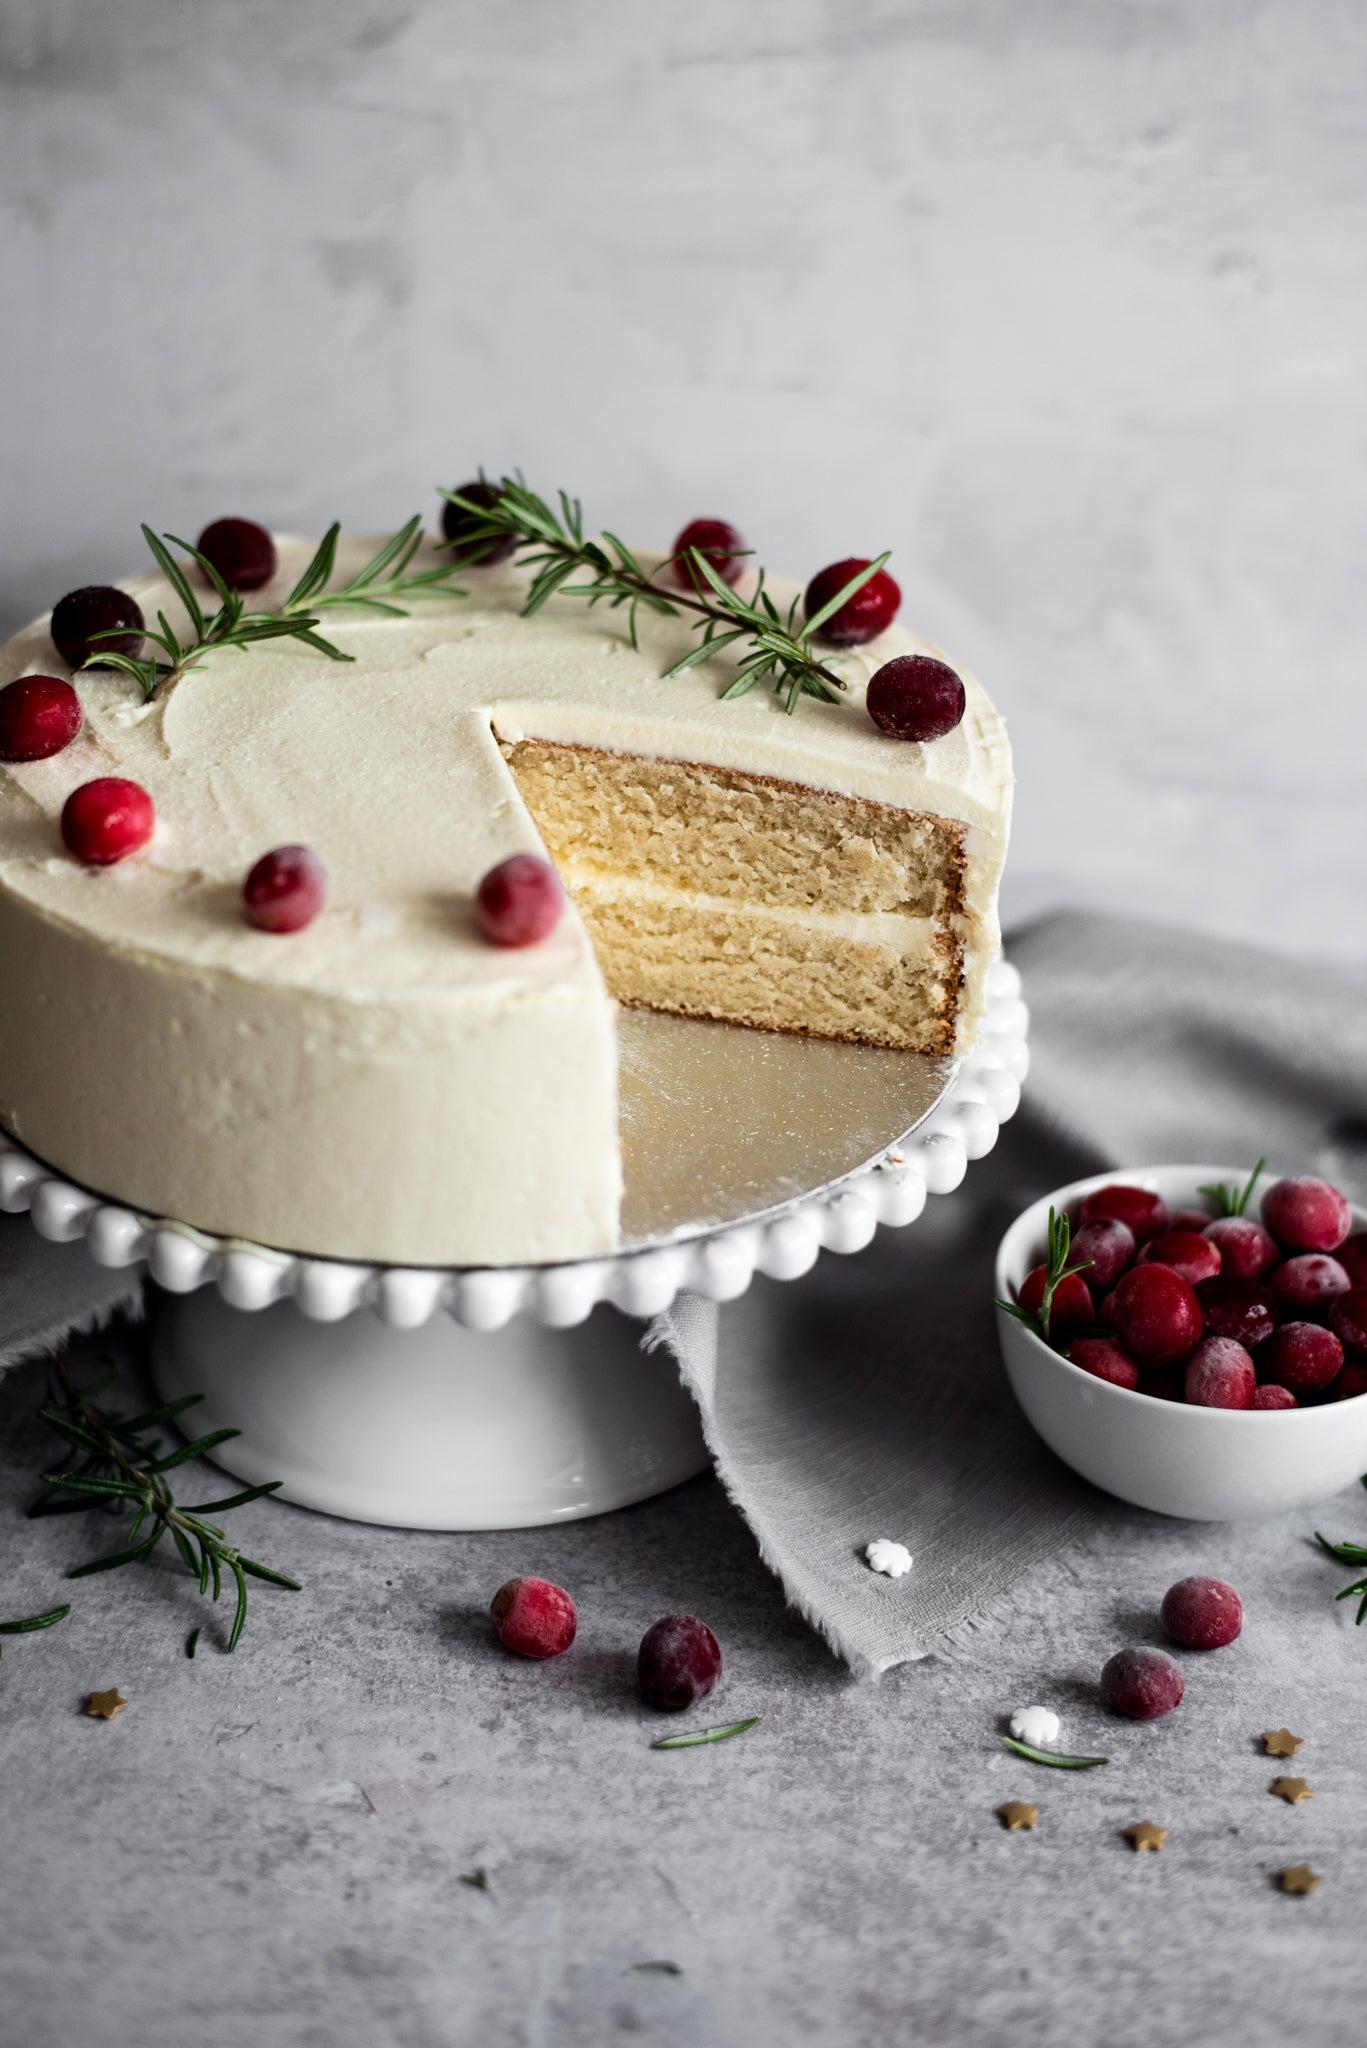 Snowy-White-Christmas-Cake-WEB-RES-8.jpg